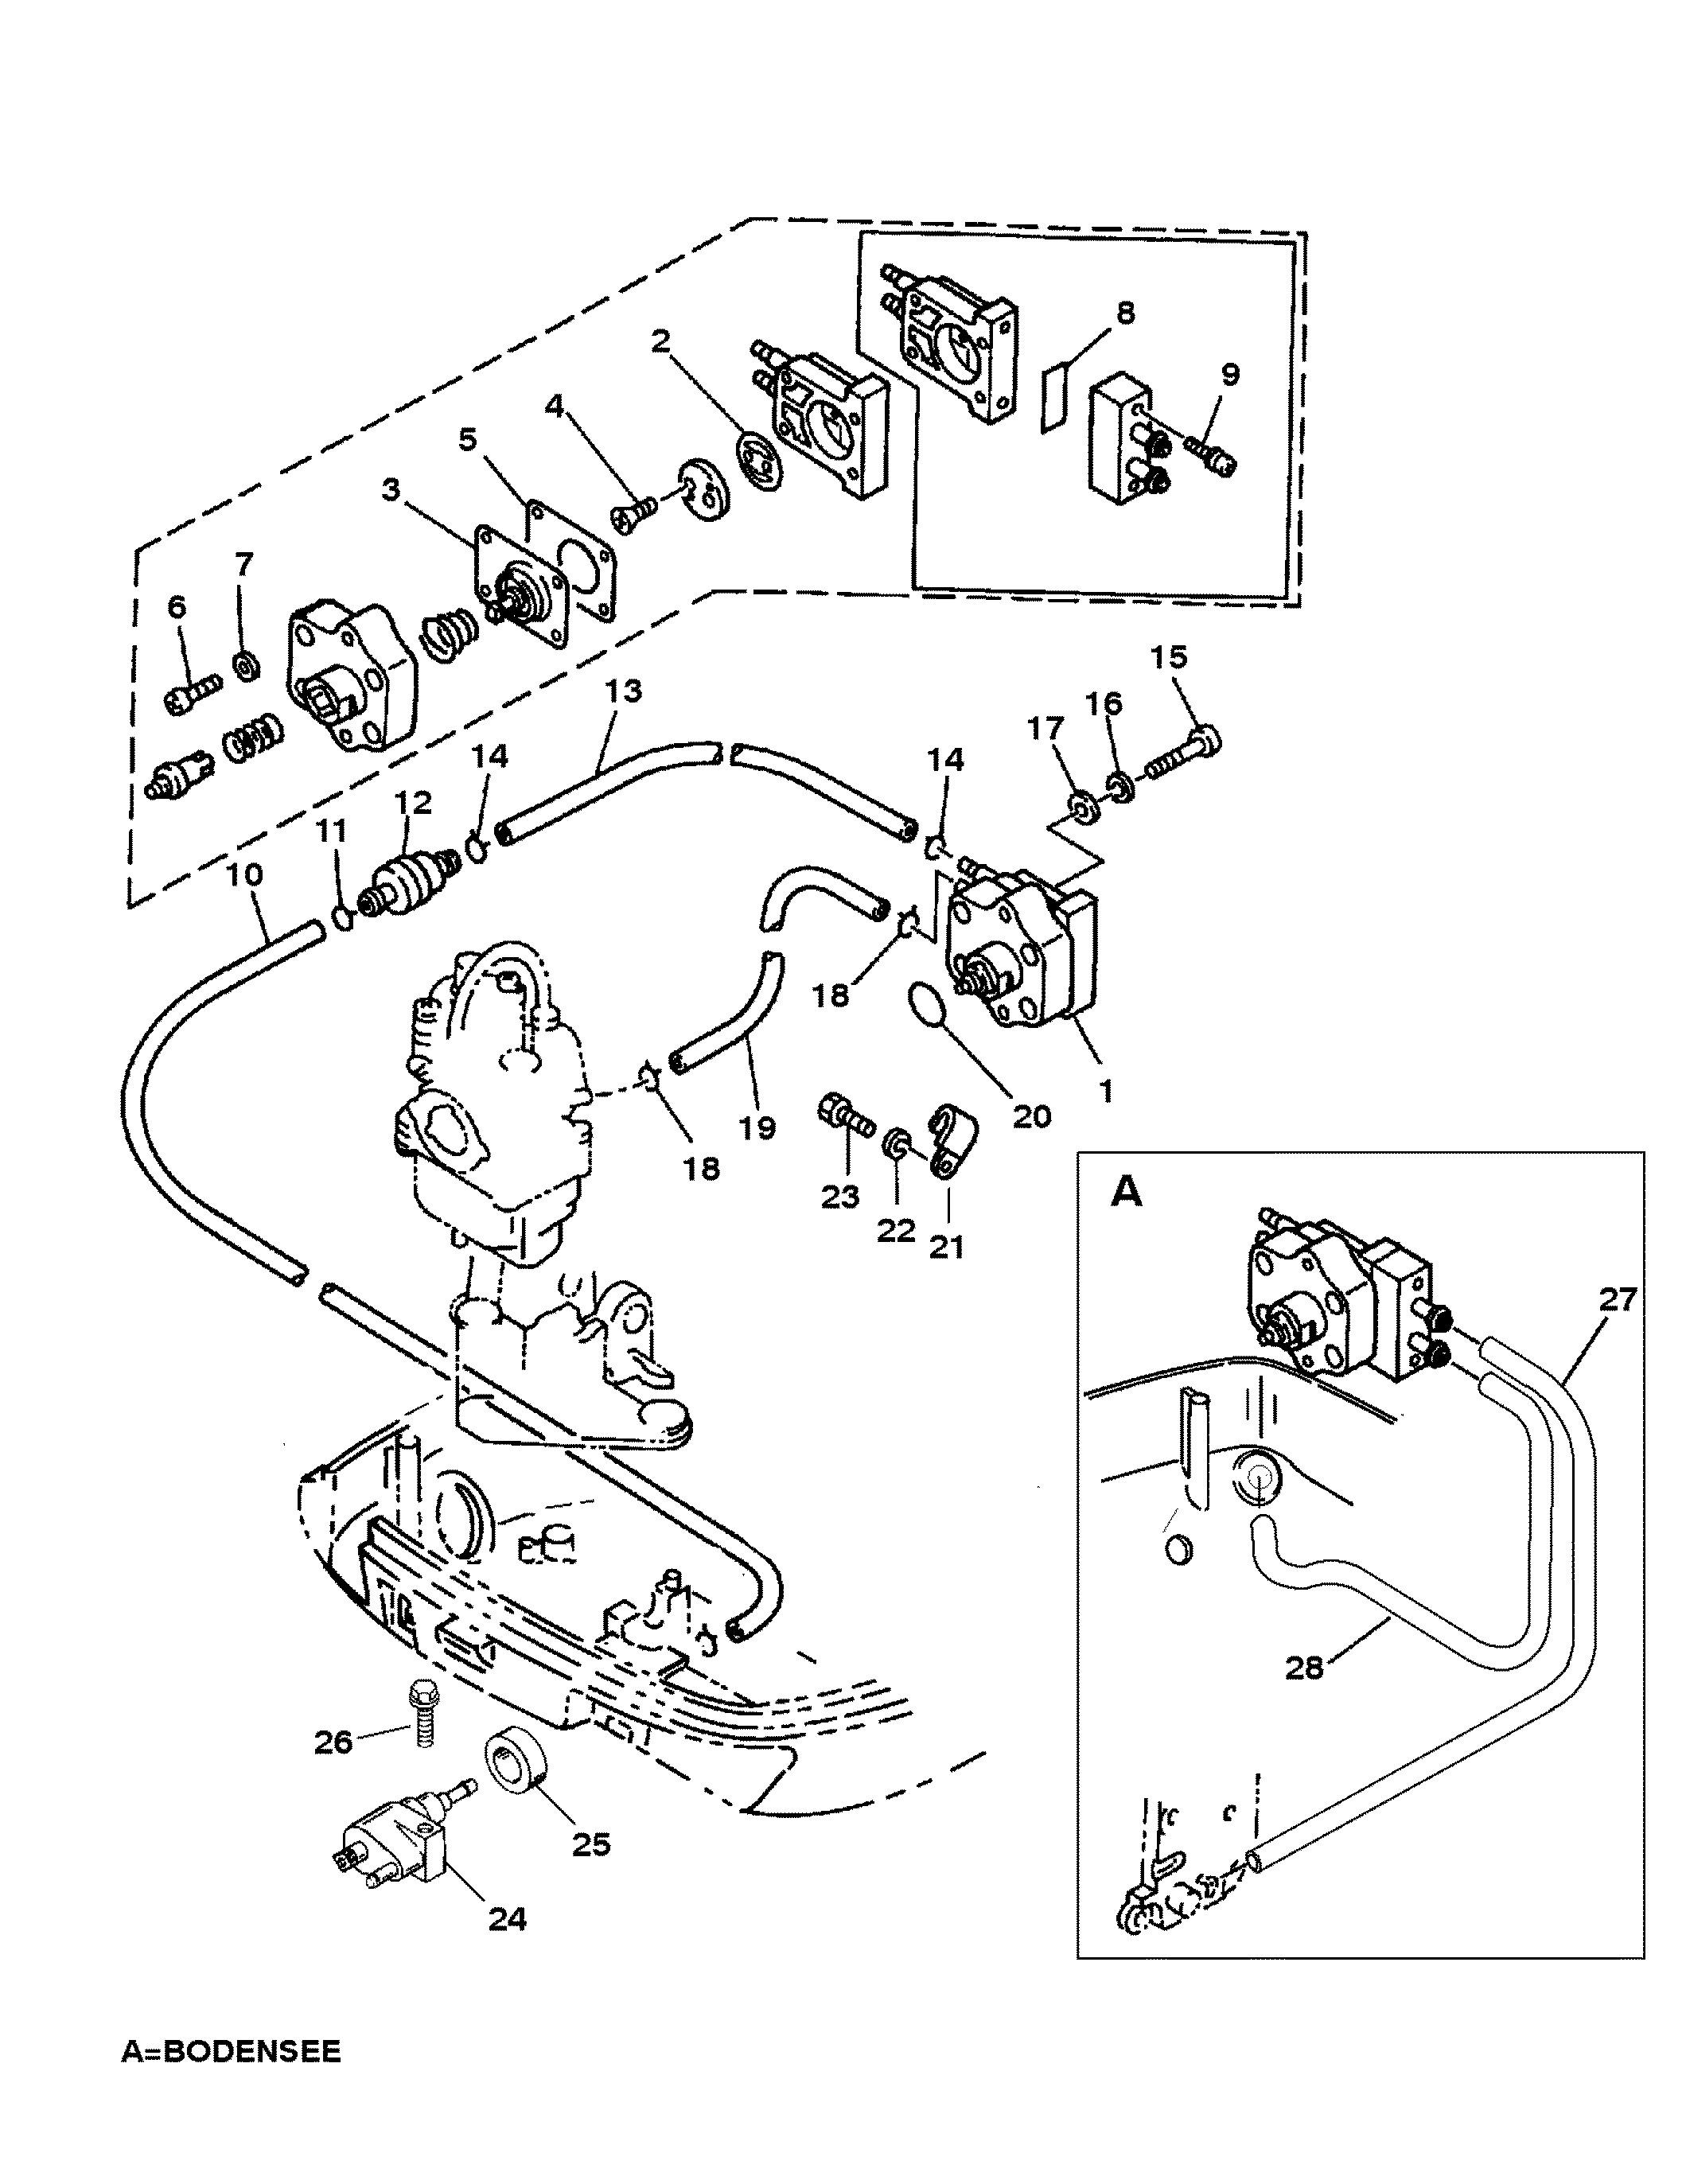 4 Stroke Petrol Engine Diagram Fuel Pump for Mariner Mercury 9 9 8  Bondensee 4 Stroke